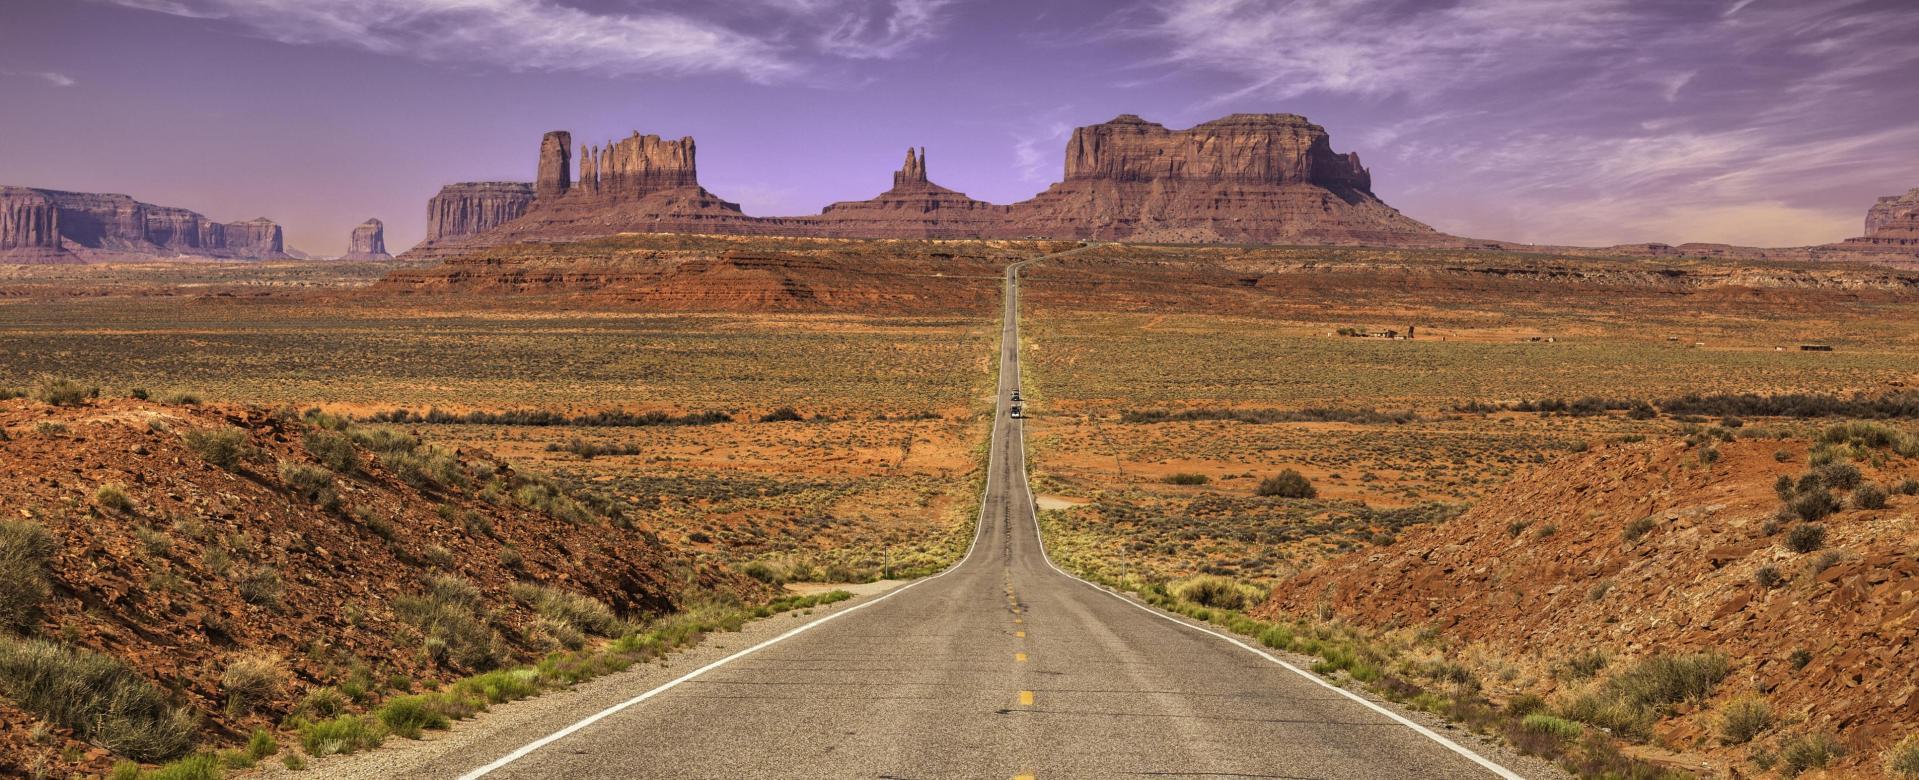 Trekking États-Unis : Les parcs mythiques en van aménagé